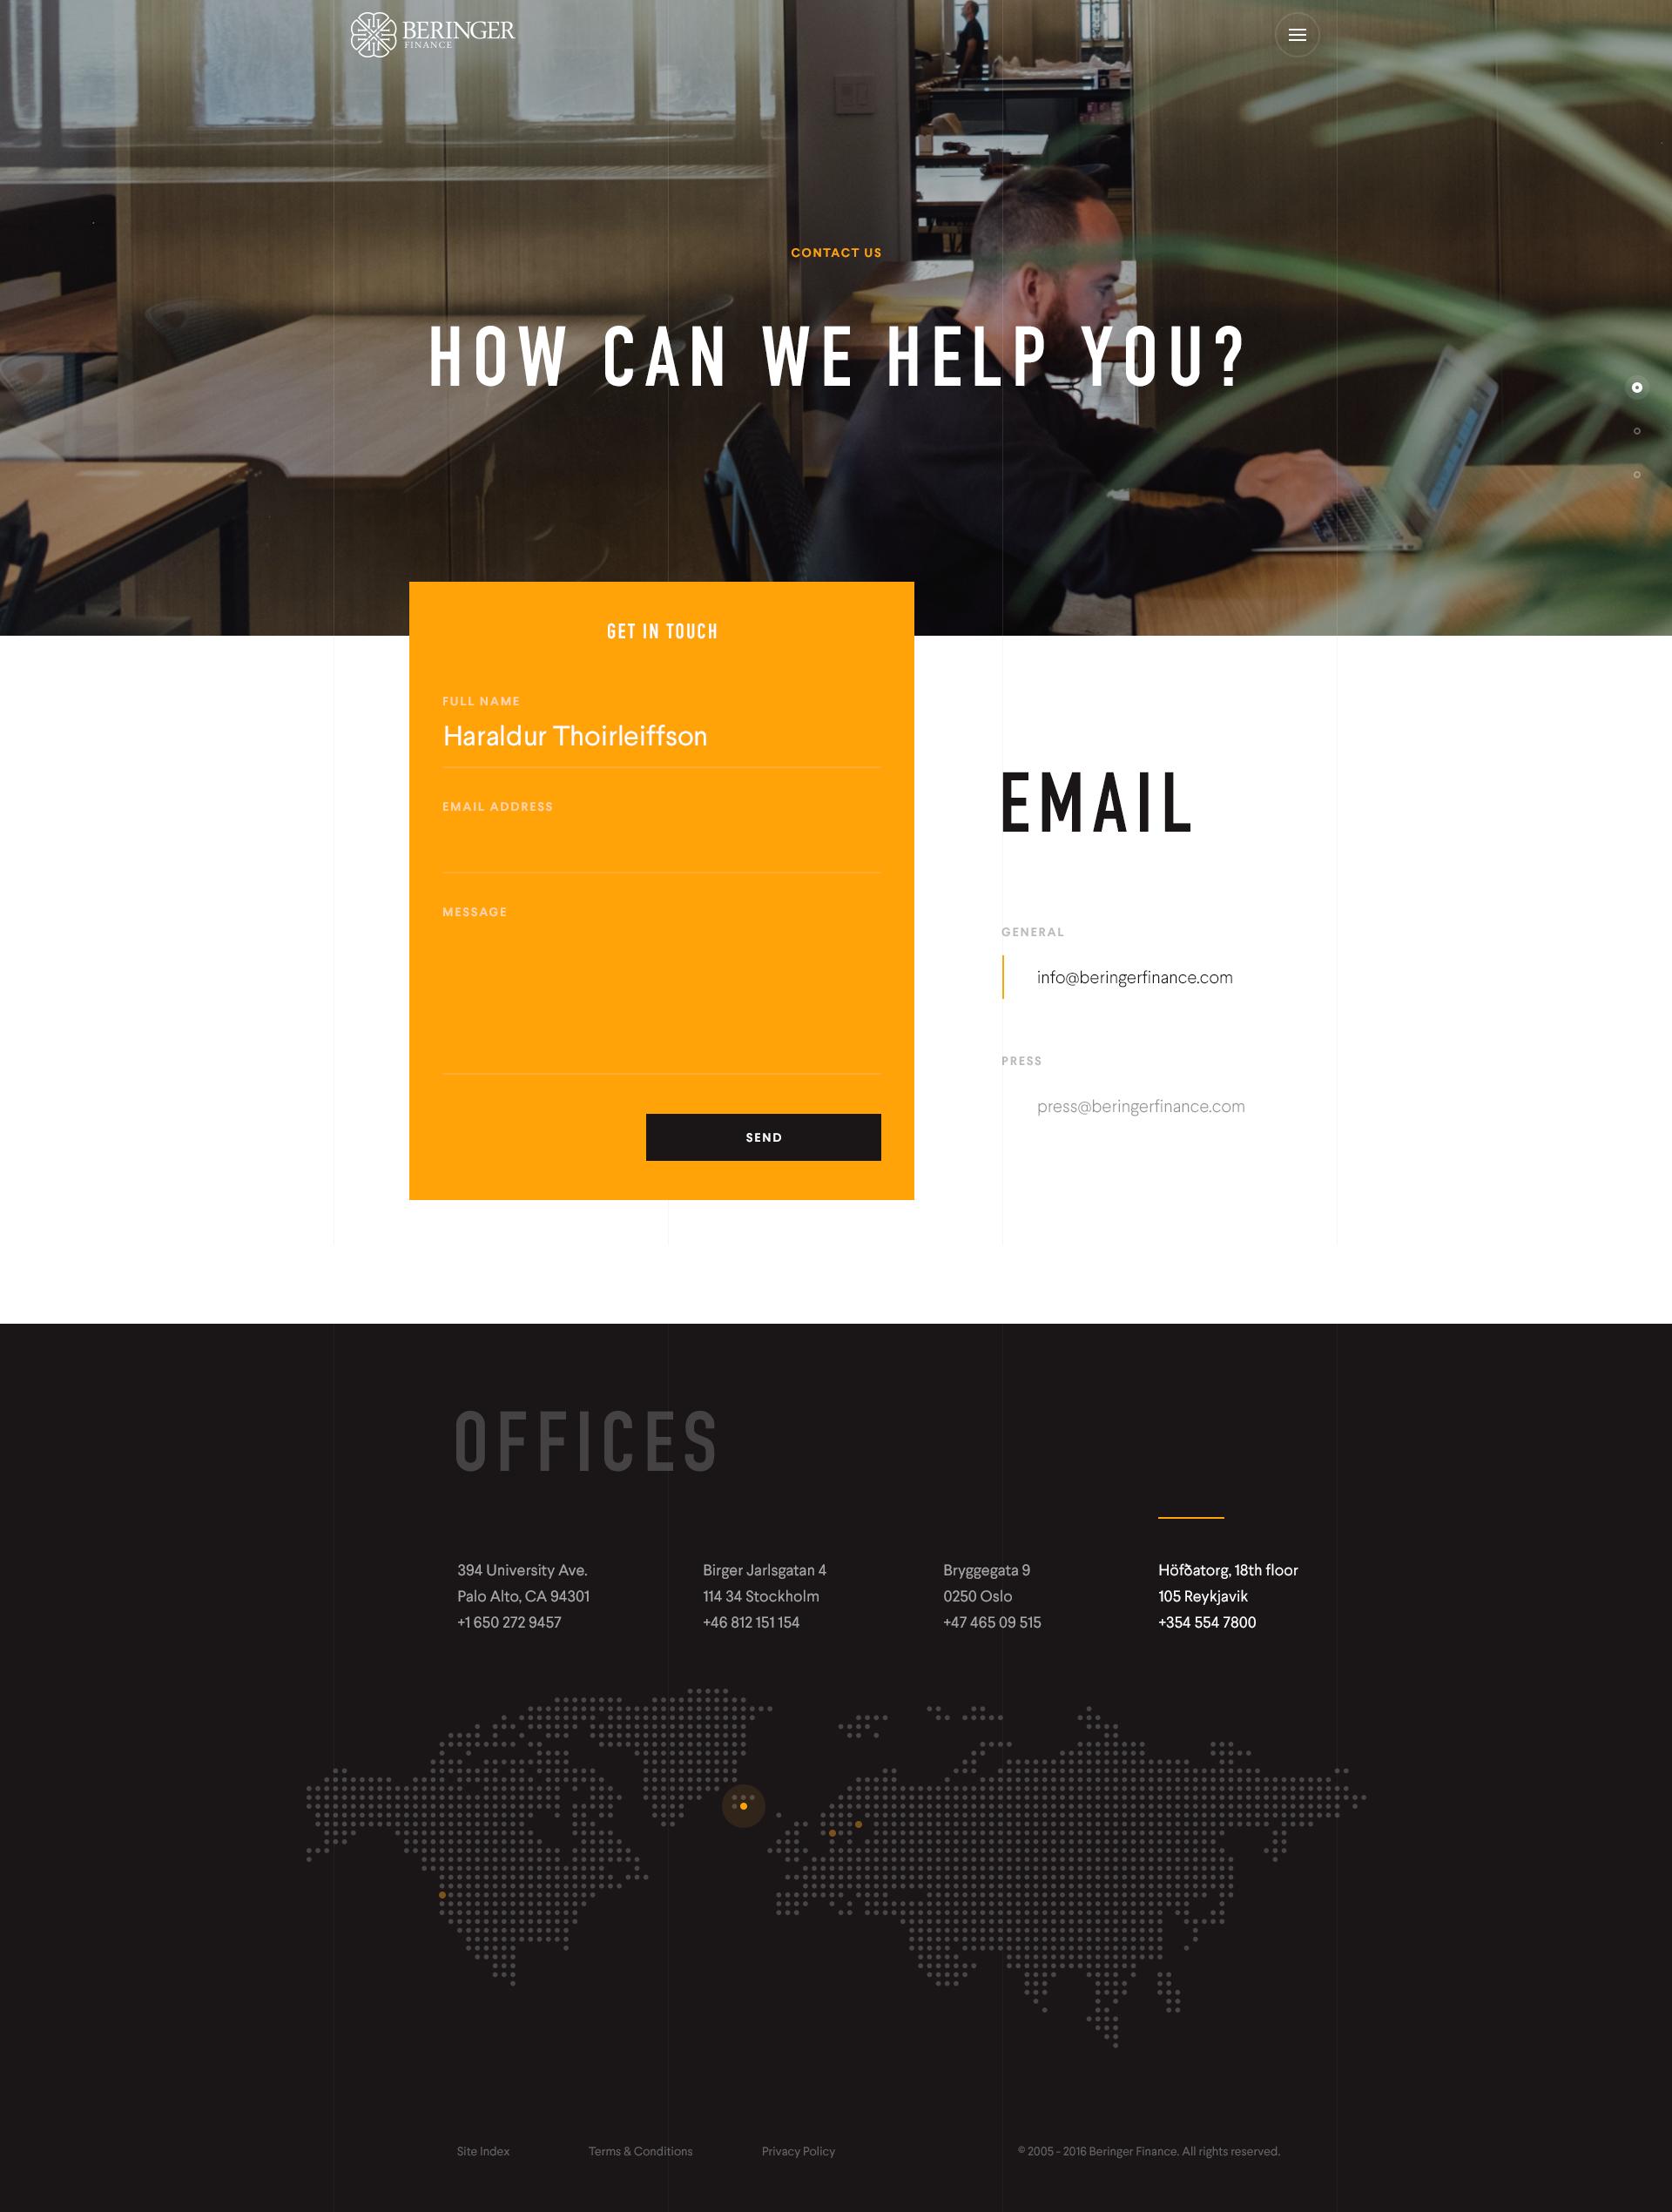 Beringer Design Contact Web Design Web App Design Web Design Inspiration